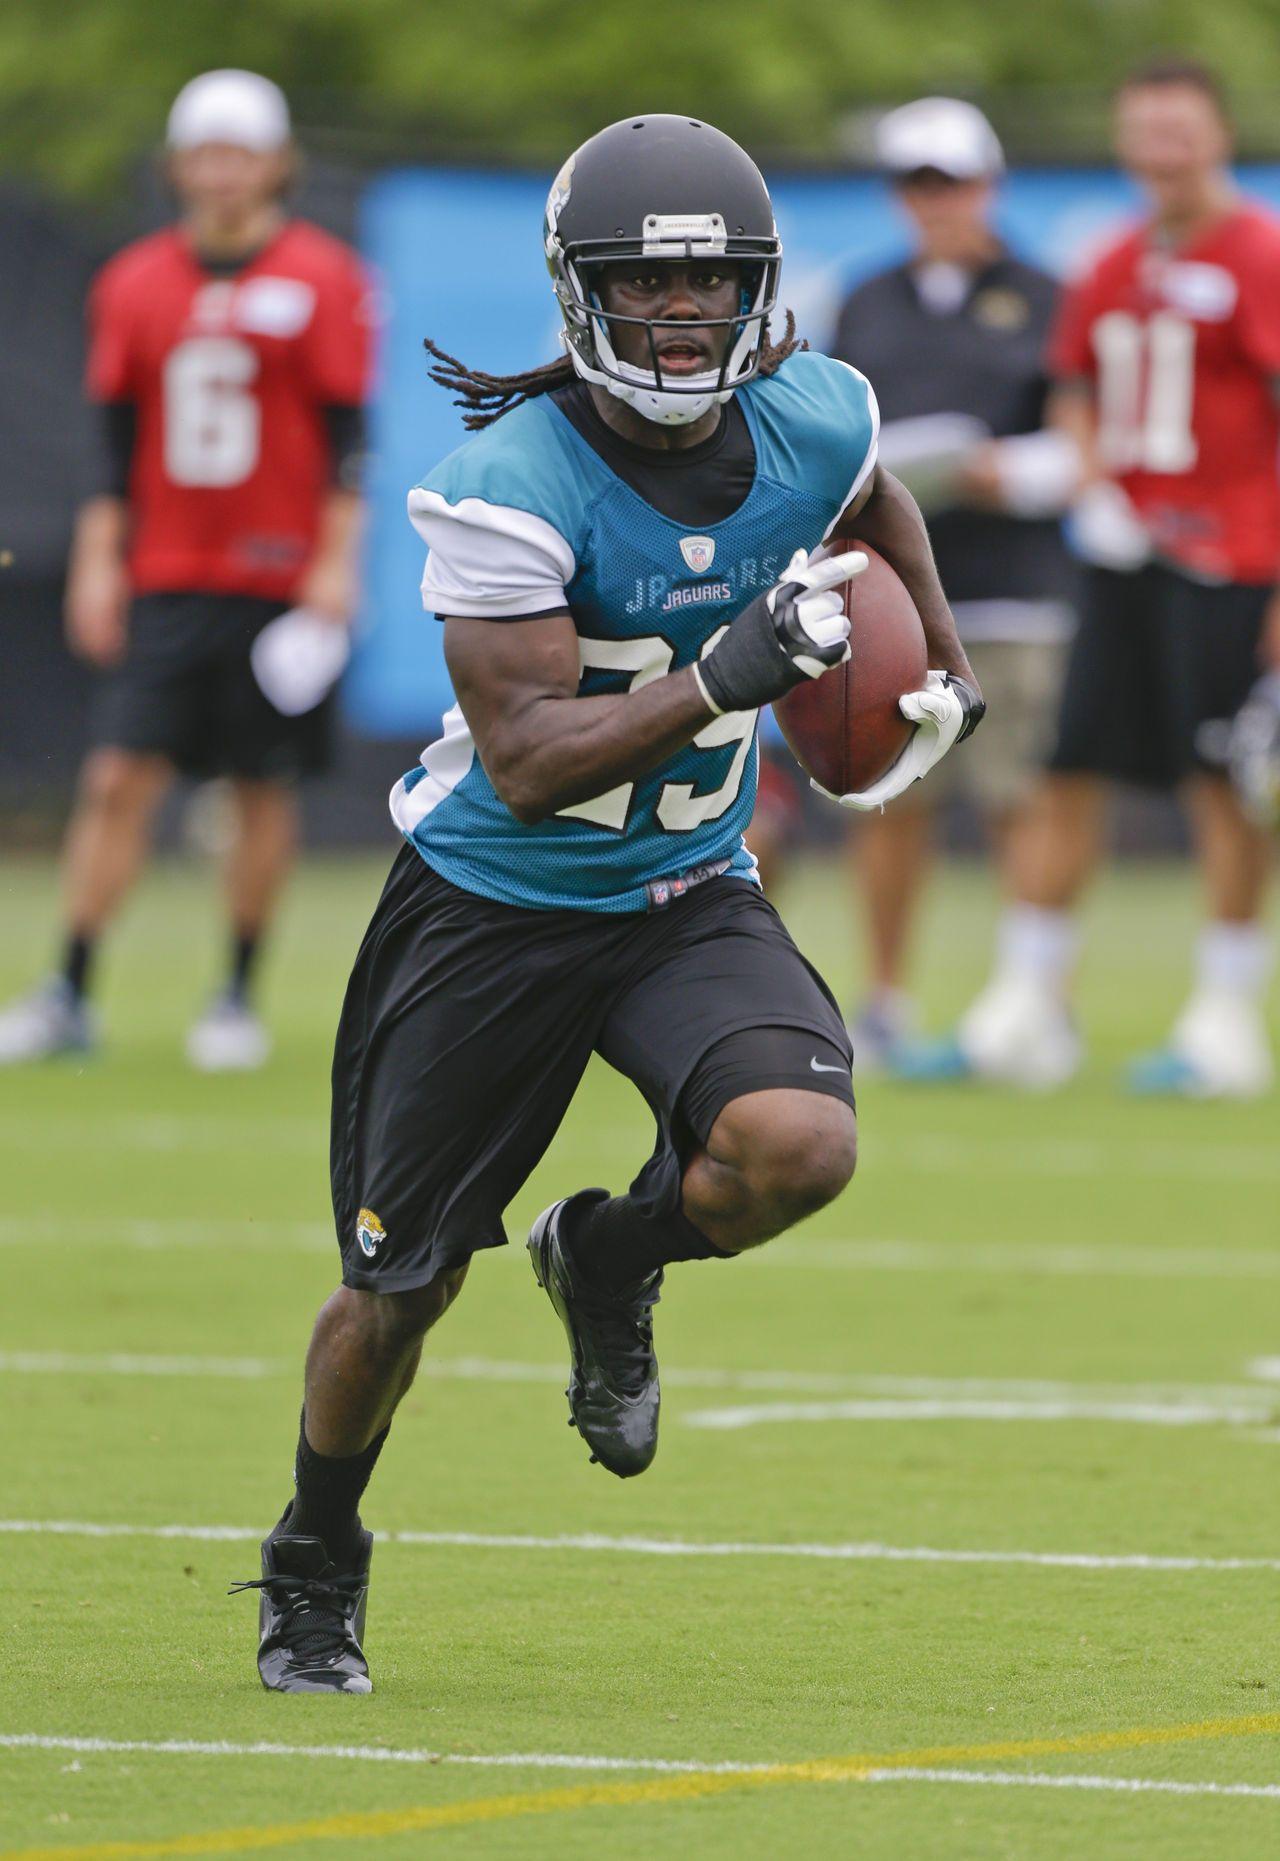 Denard Robinson, Jacksonville Jaguars, New Jaguars Player, New